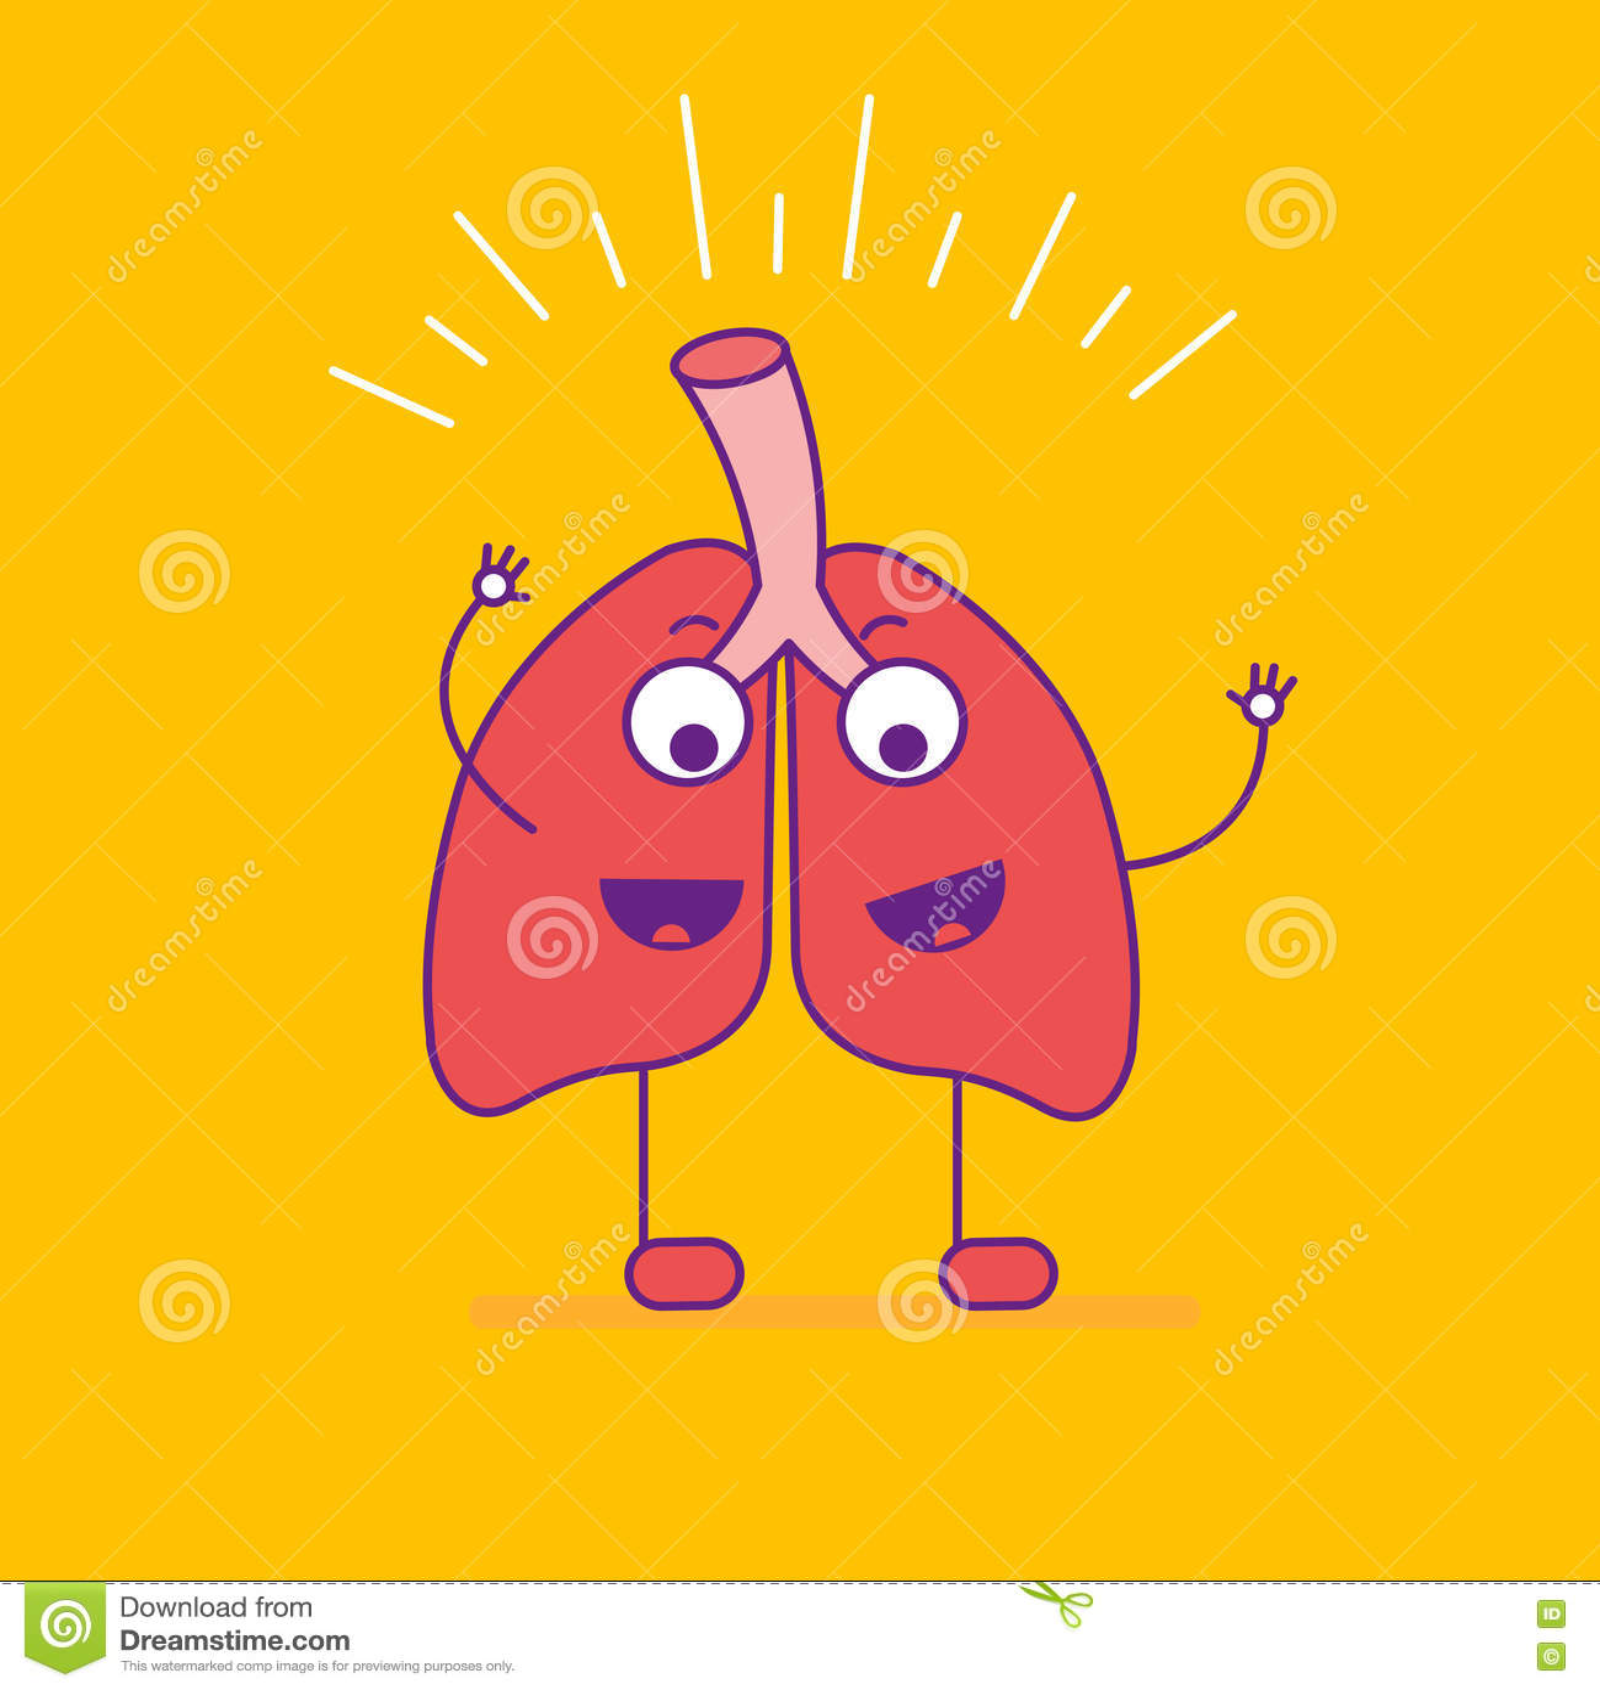 Respiration cartoons illustrations vector stock images - Imagenes con animacion ...